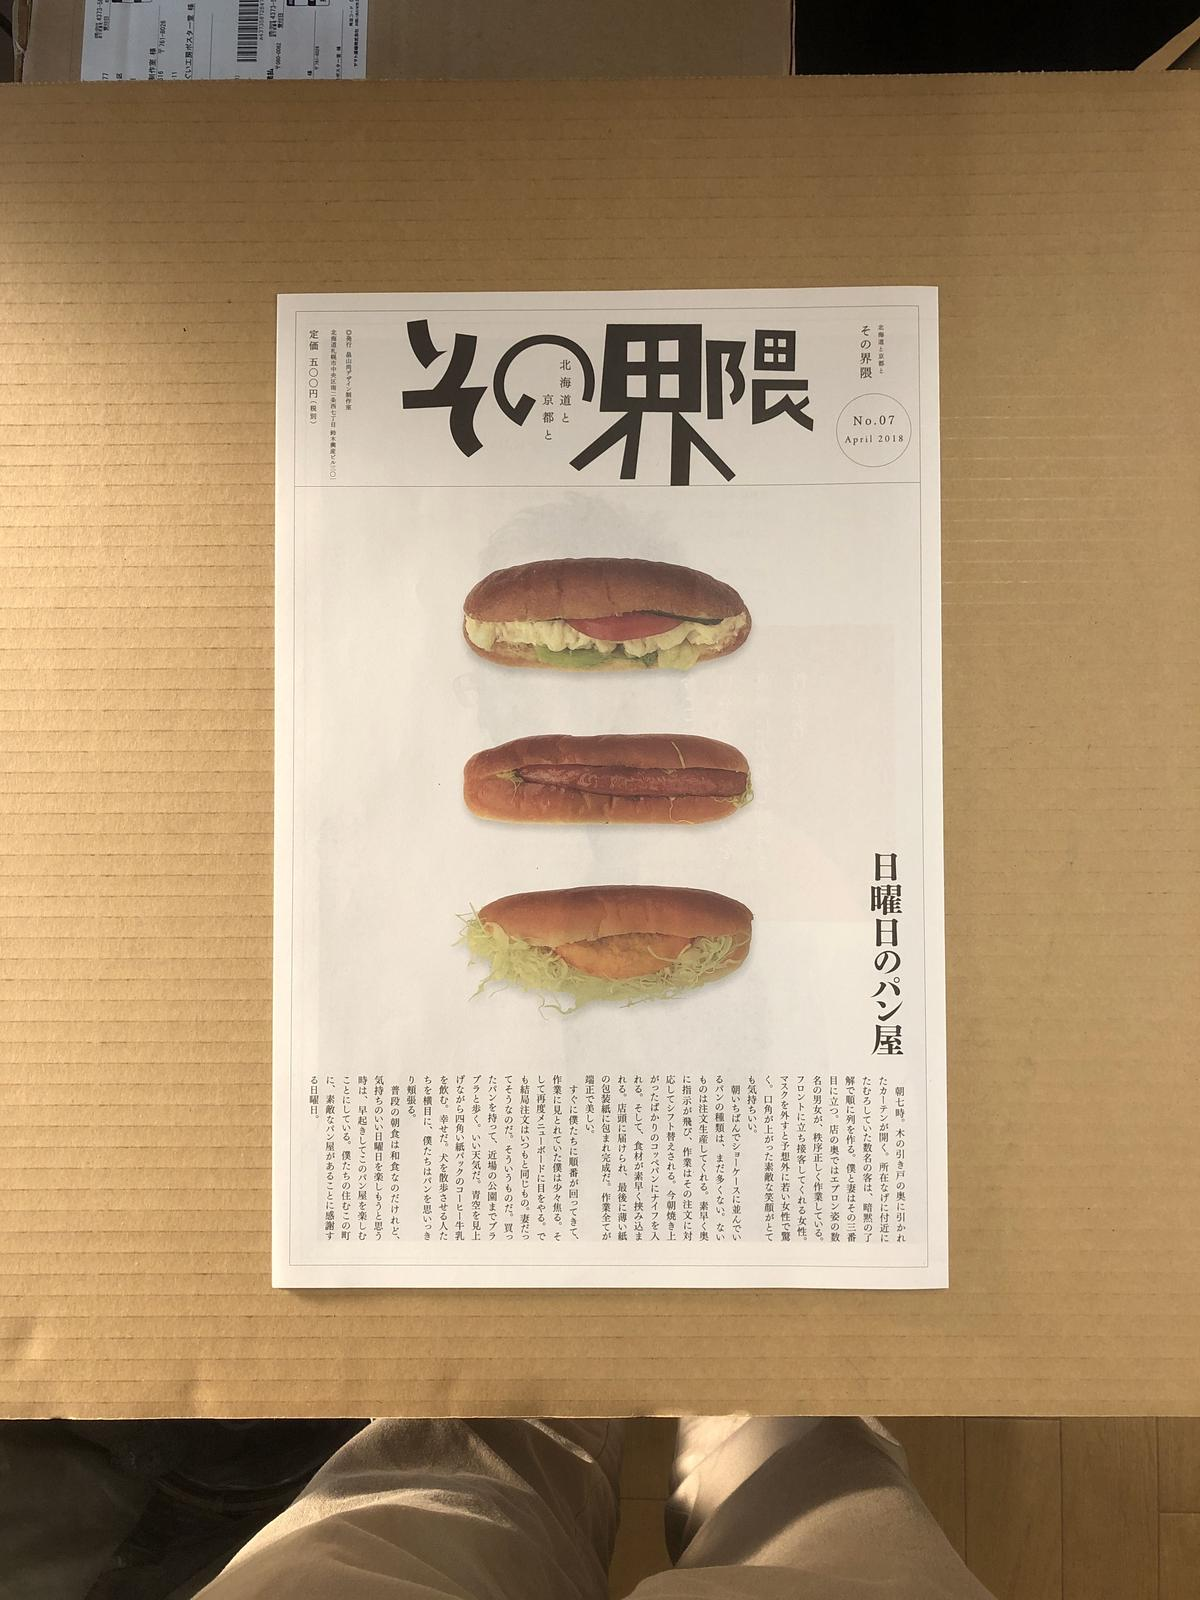 ng-non-bindable>北海道と京都と その界隈 第7号 | HH DESIGN